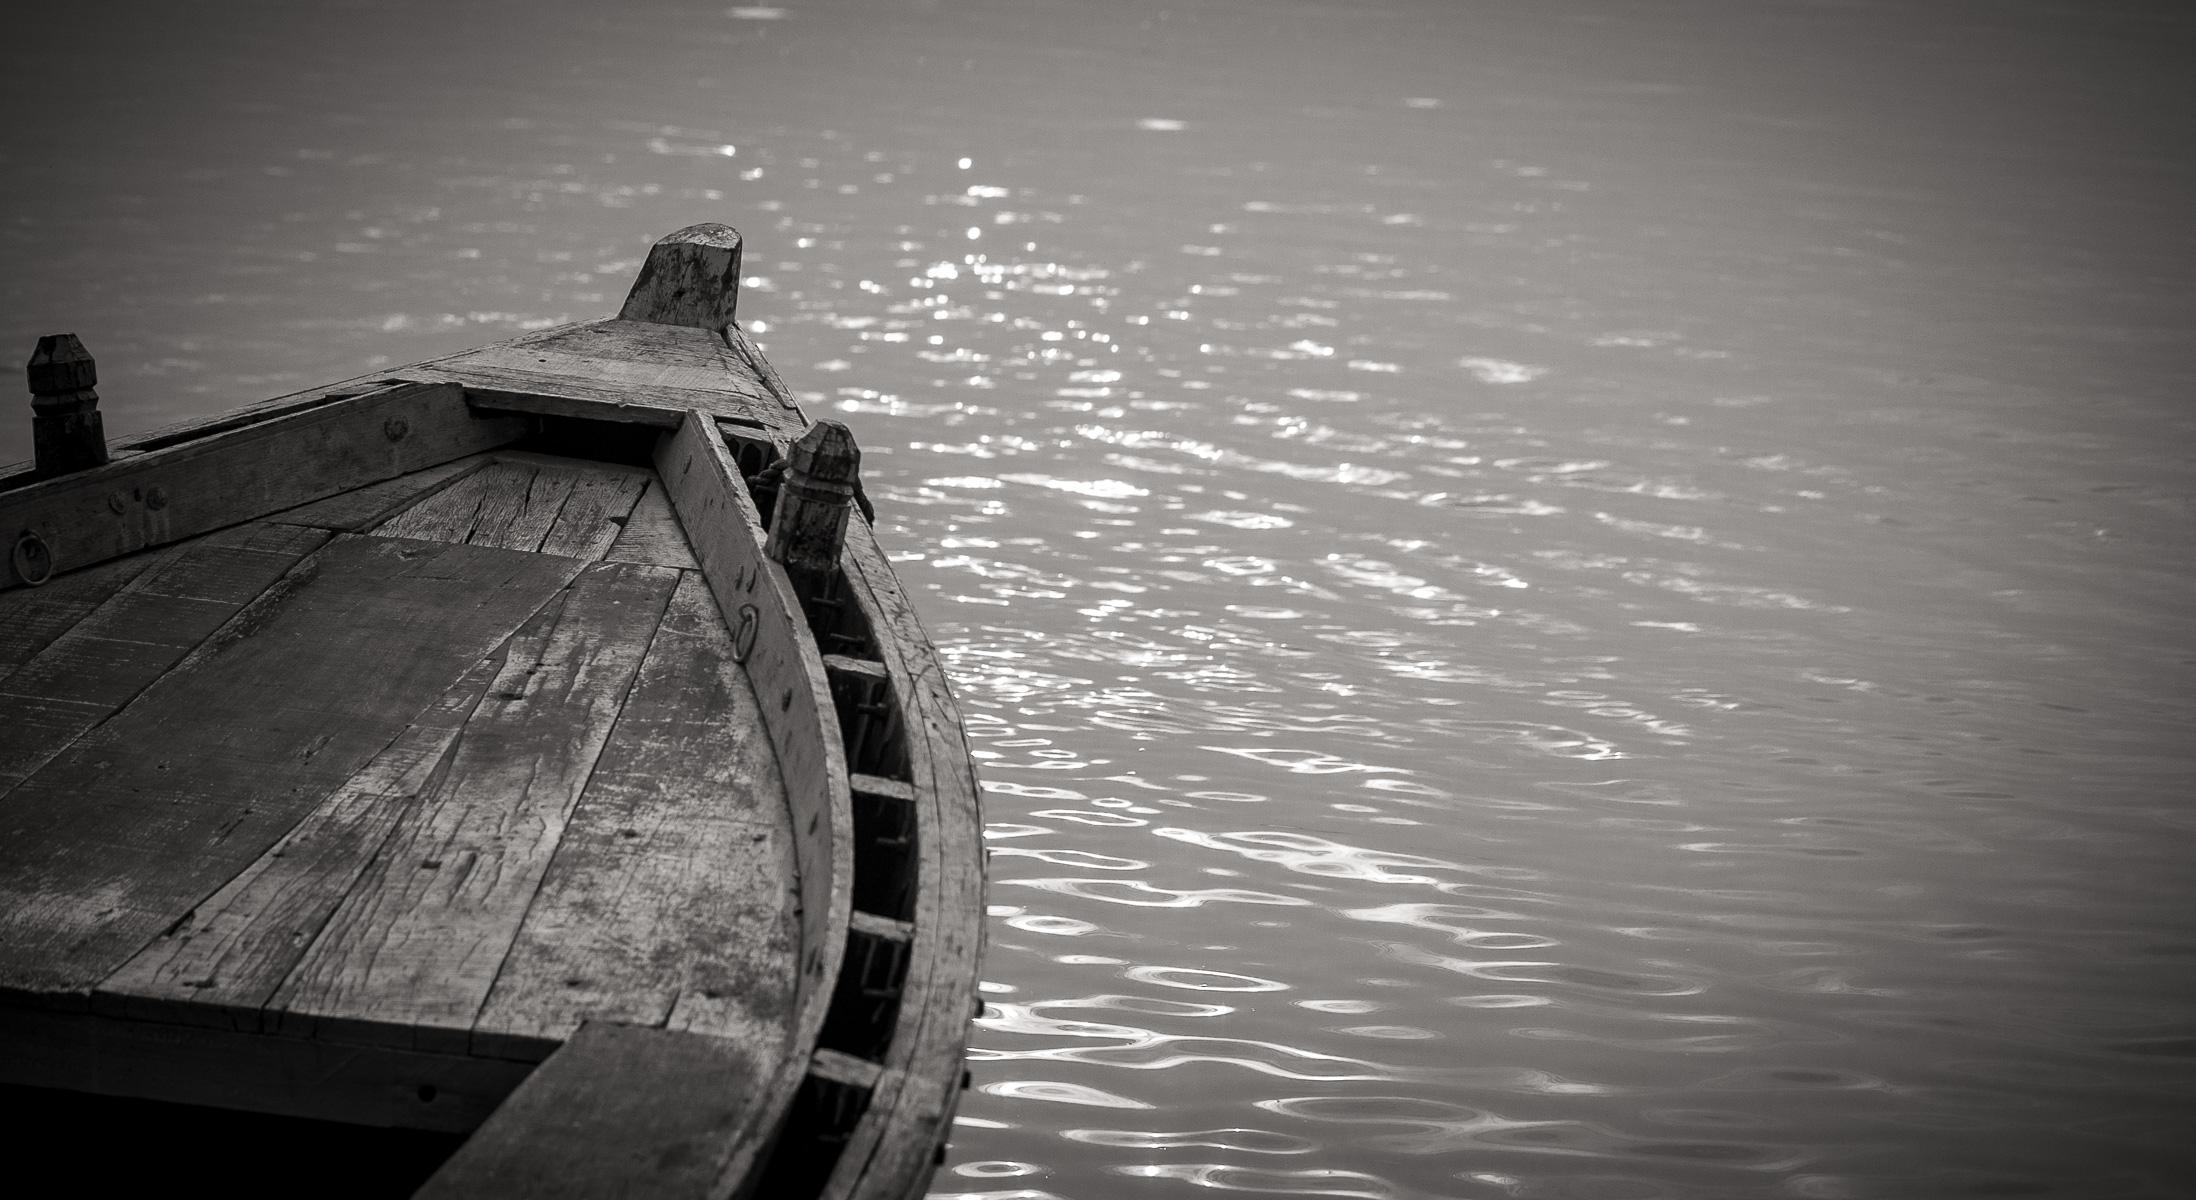 Boats on the Ganges, Varanasai